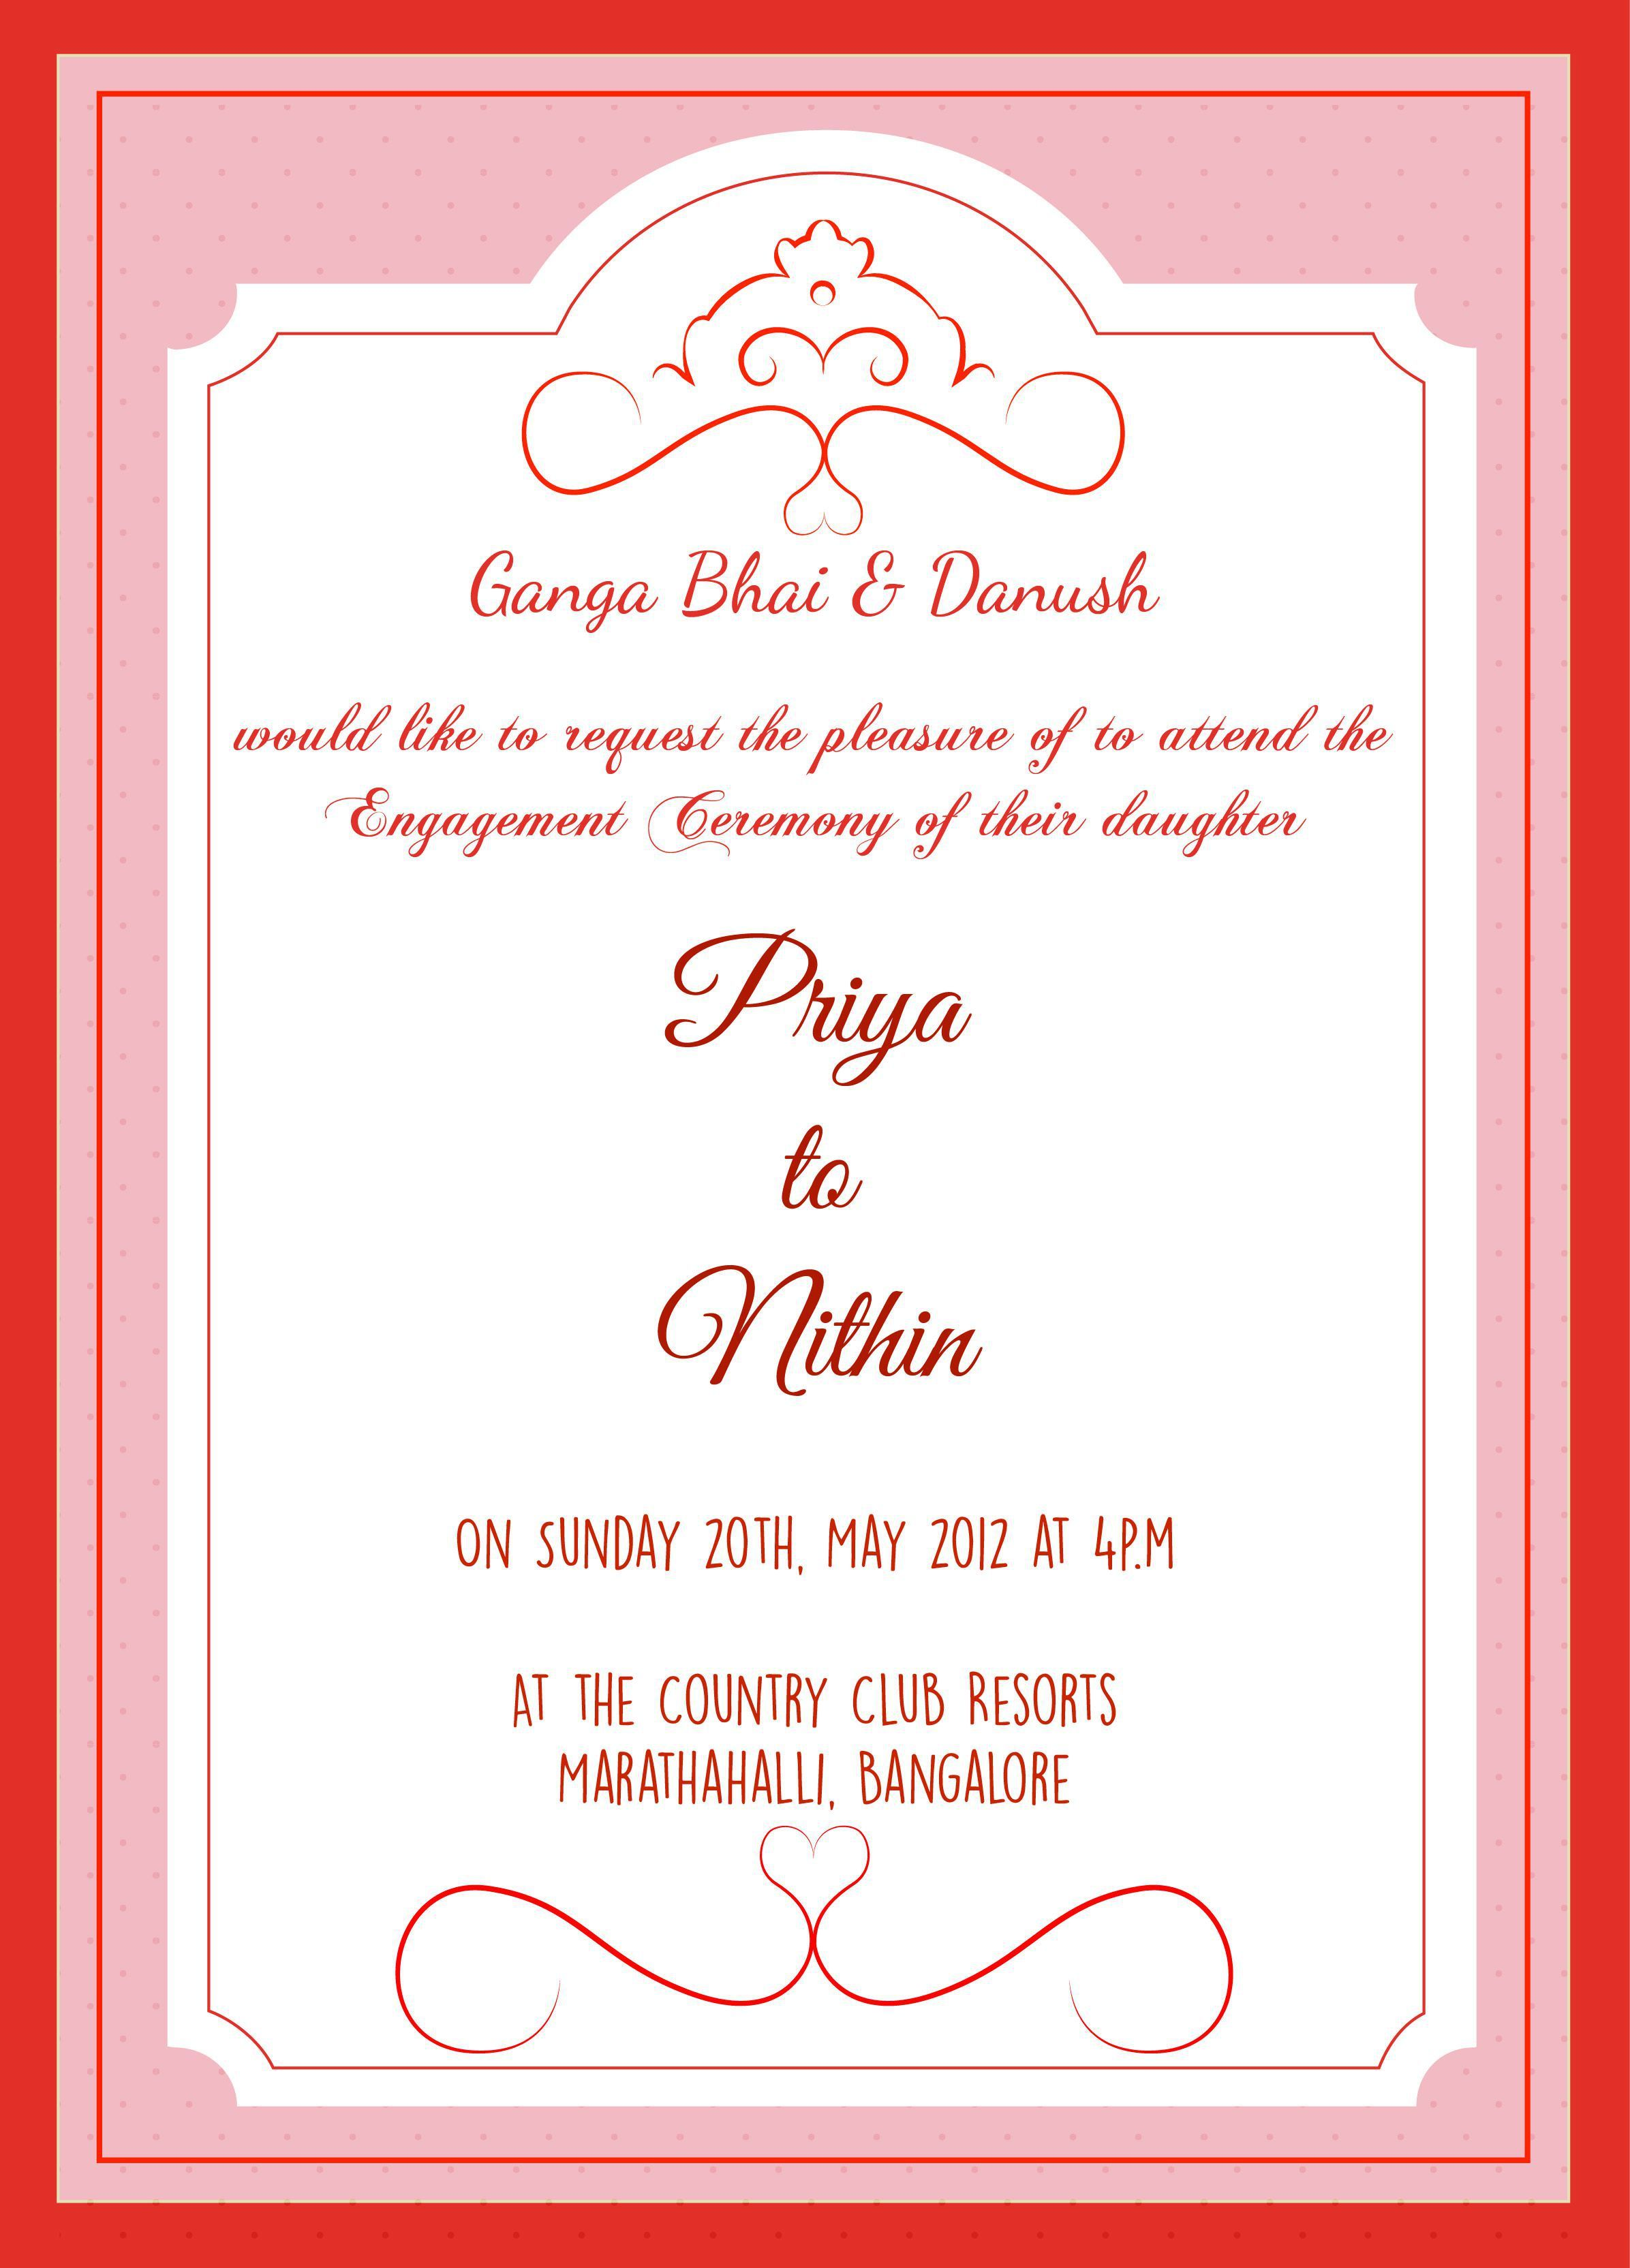 Accept WhatsApp Invitation As Speaker vaish Betrothel